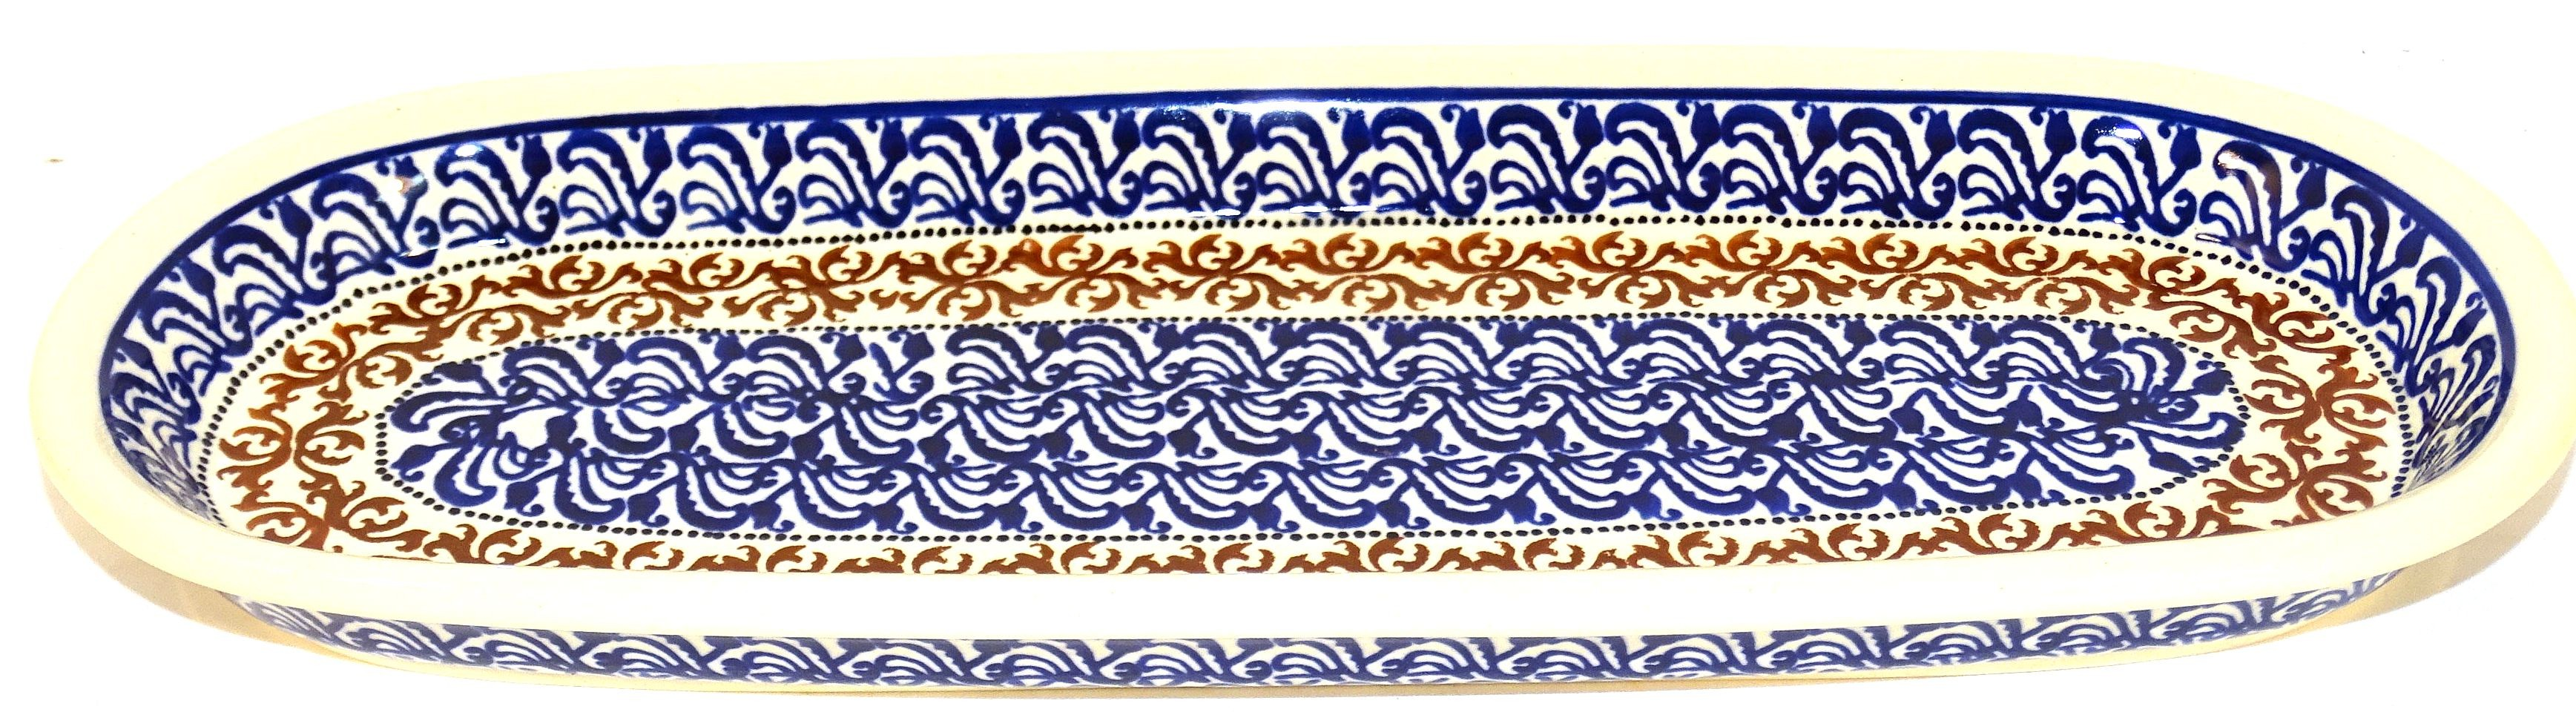 "Pottery Avenue 11"" CUBA Cracker-Olive Stoneware Tray | CLASSIC"